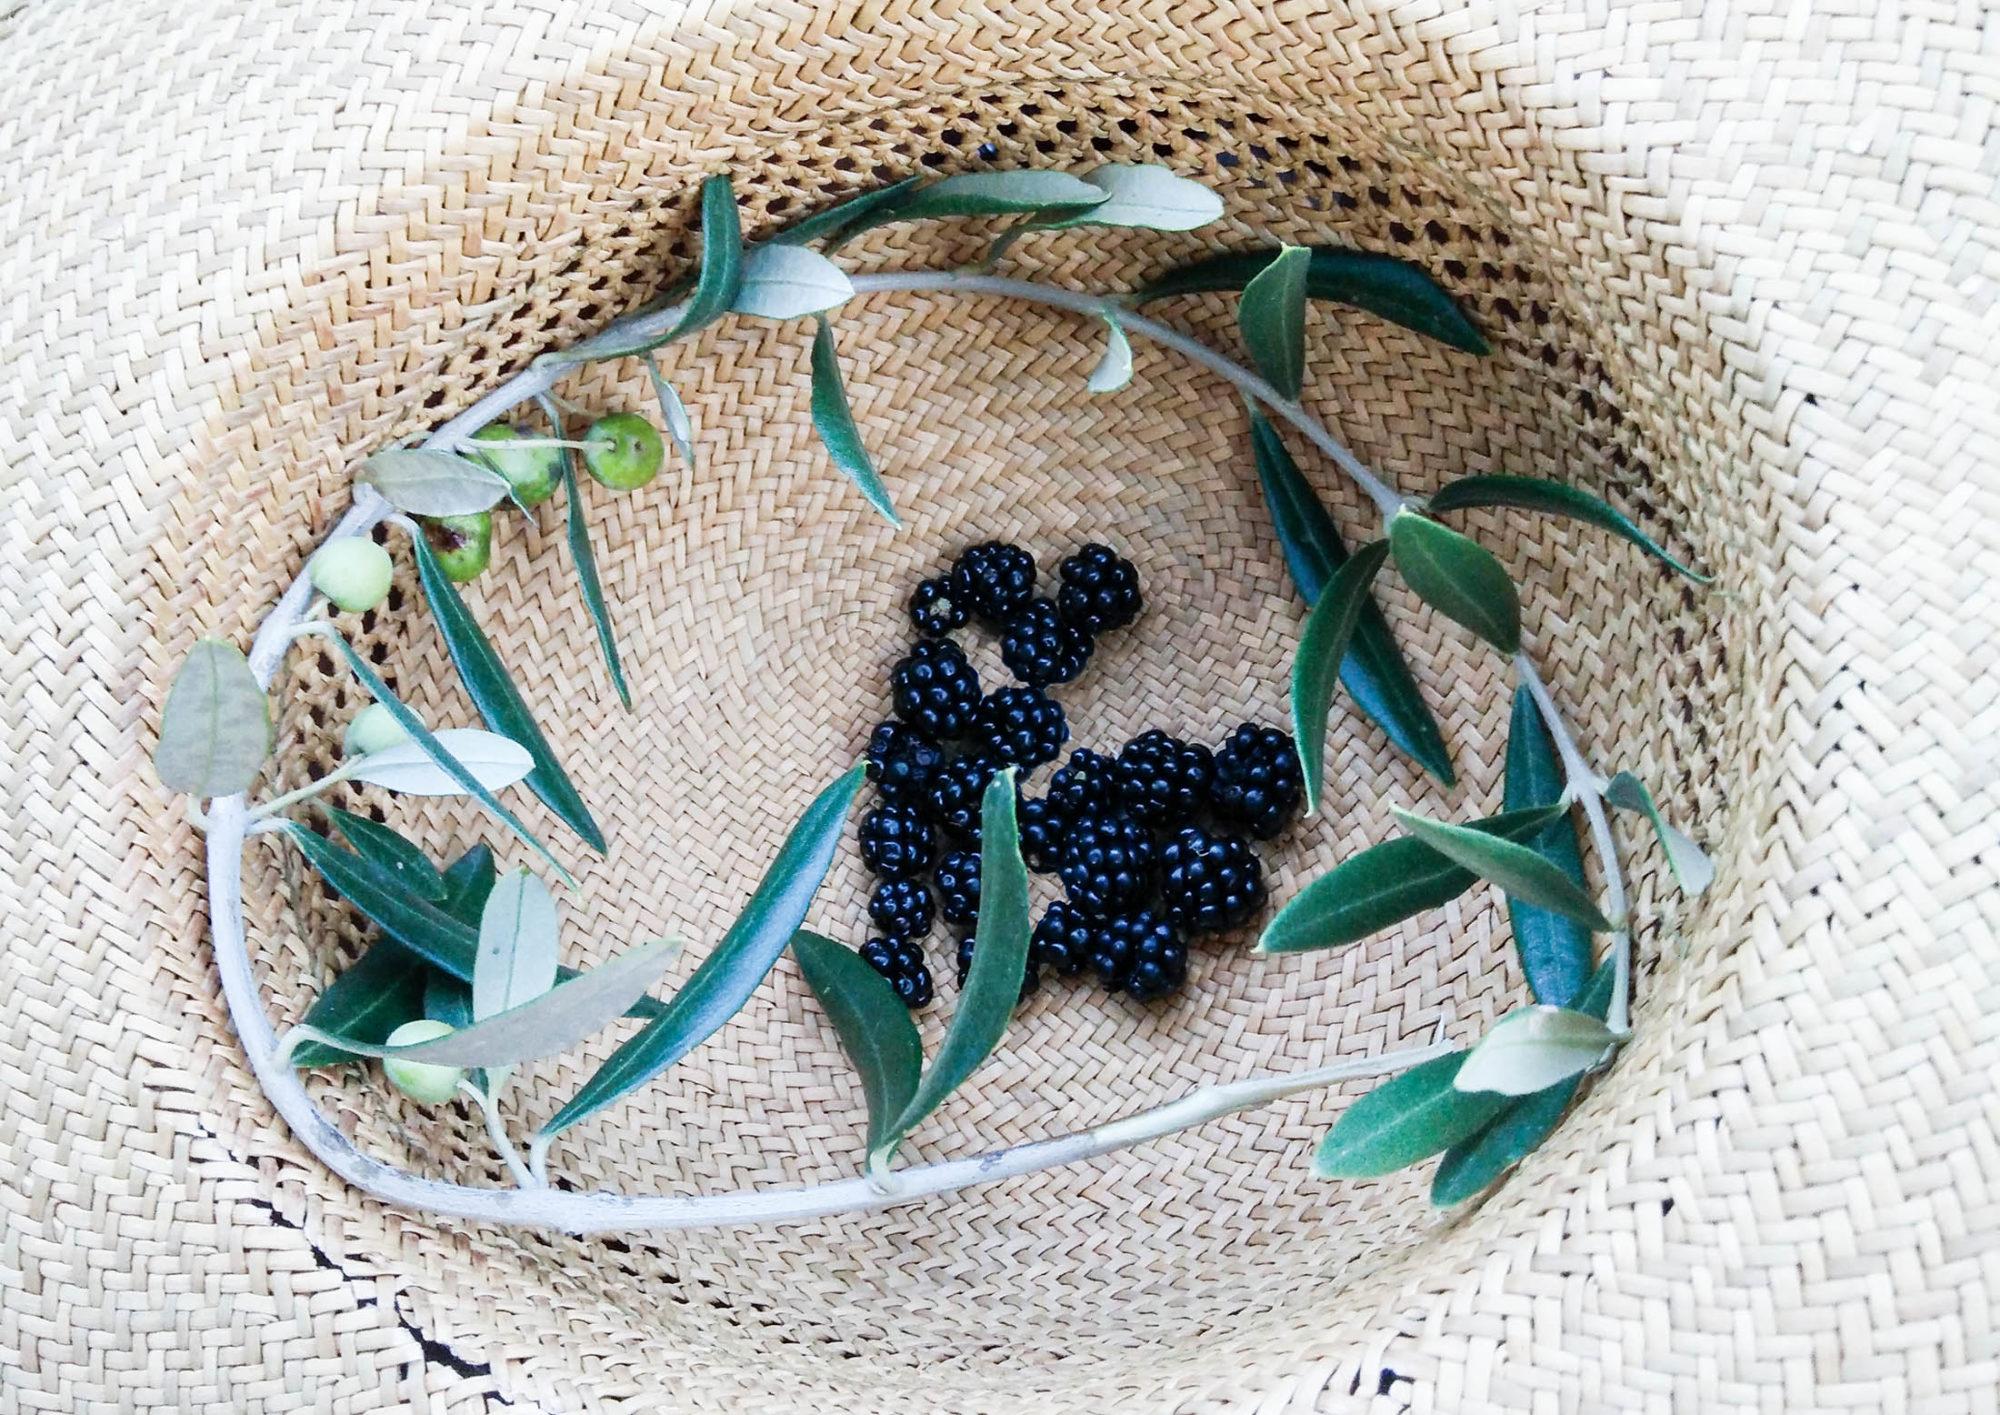 blackberries dogdays of summer vintage onlineshop graz österreich austria tuscany vegan food guide blog